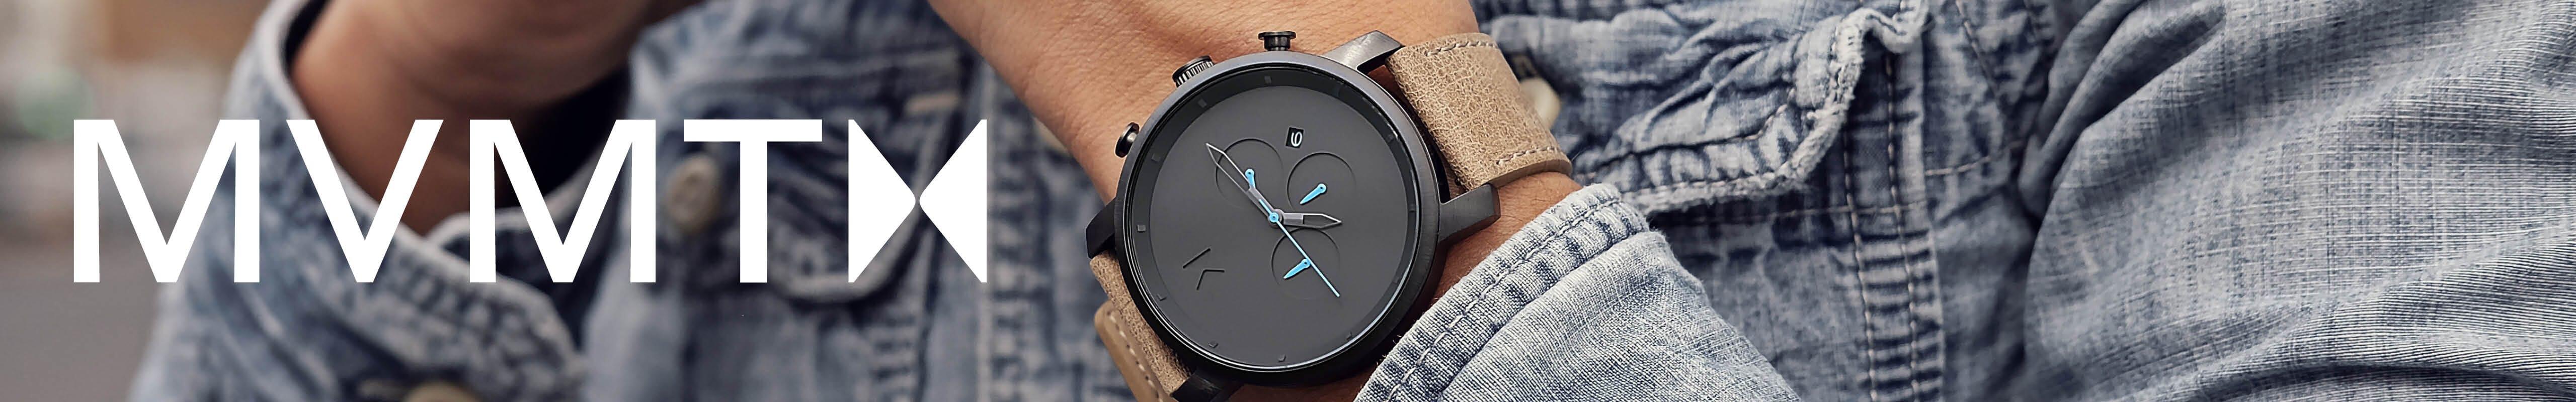 MVMT Heren Horloges